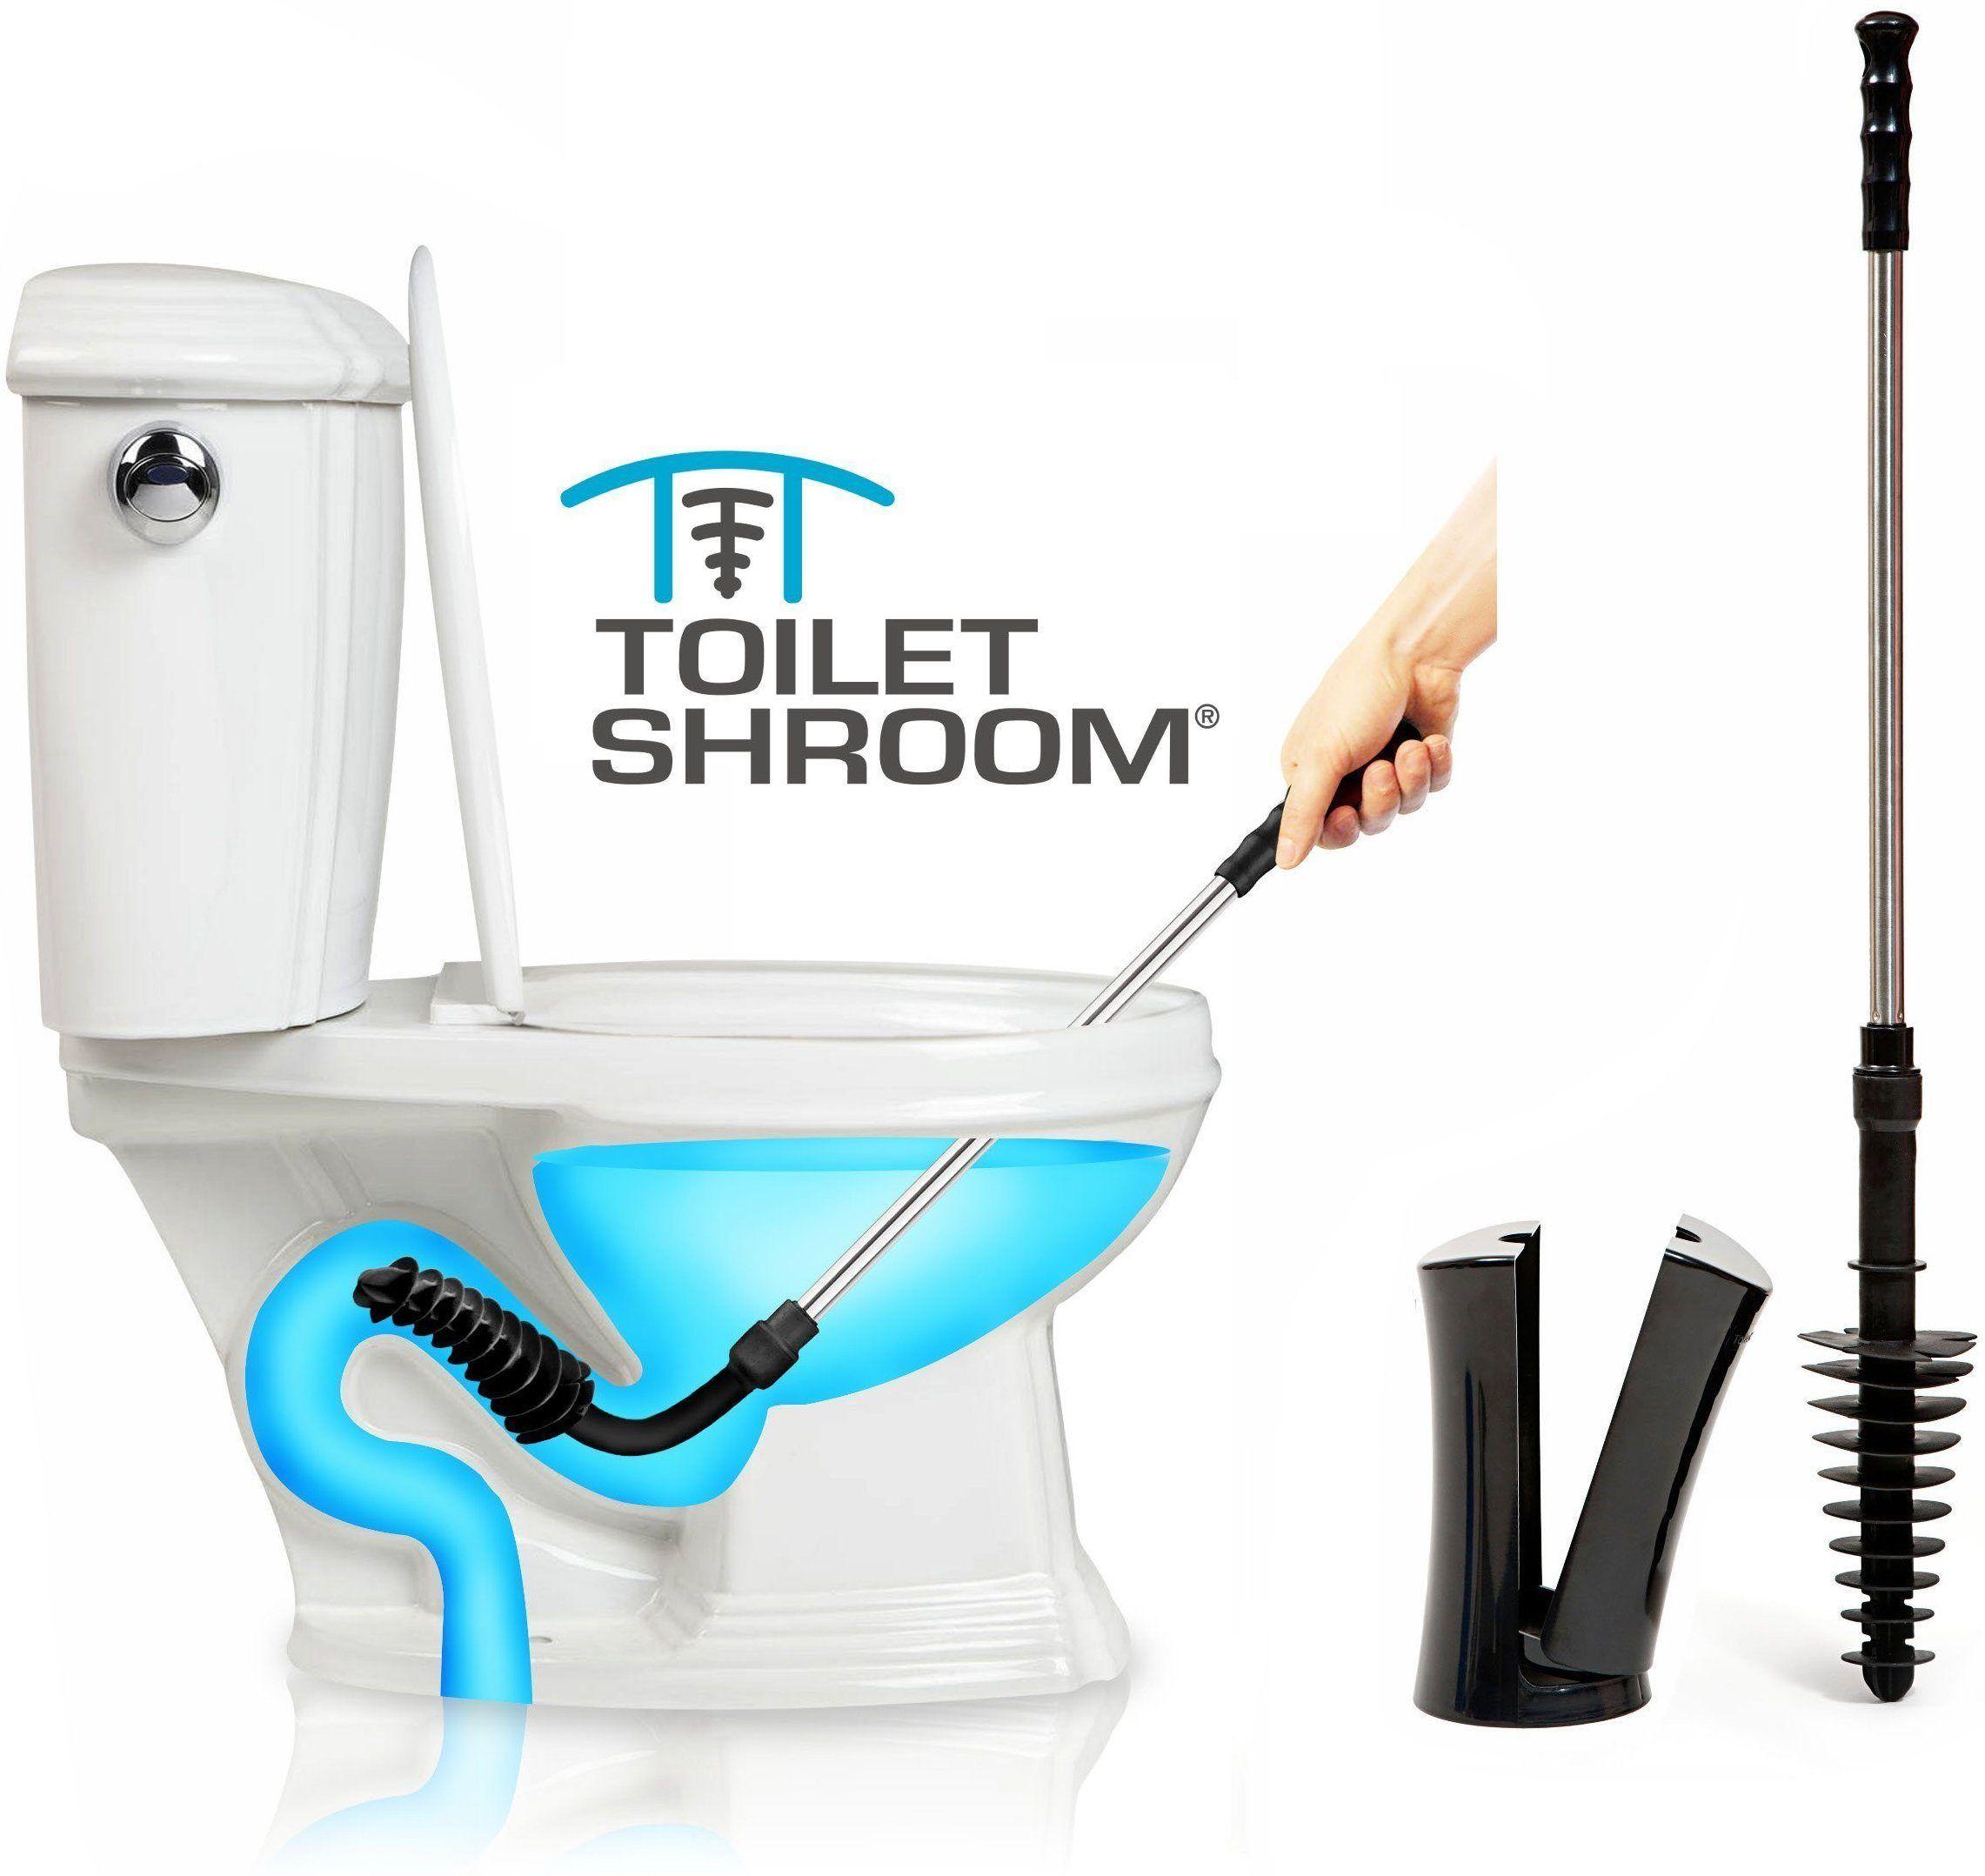 Toiletshroom Black Toilet Plunger That Unclogs Toilets In Seconds Drain Cleaner Plunger Black Toilet